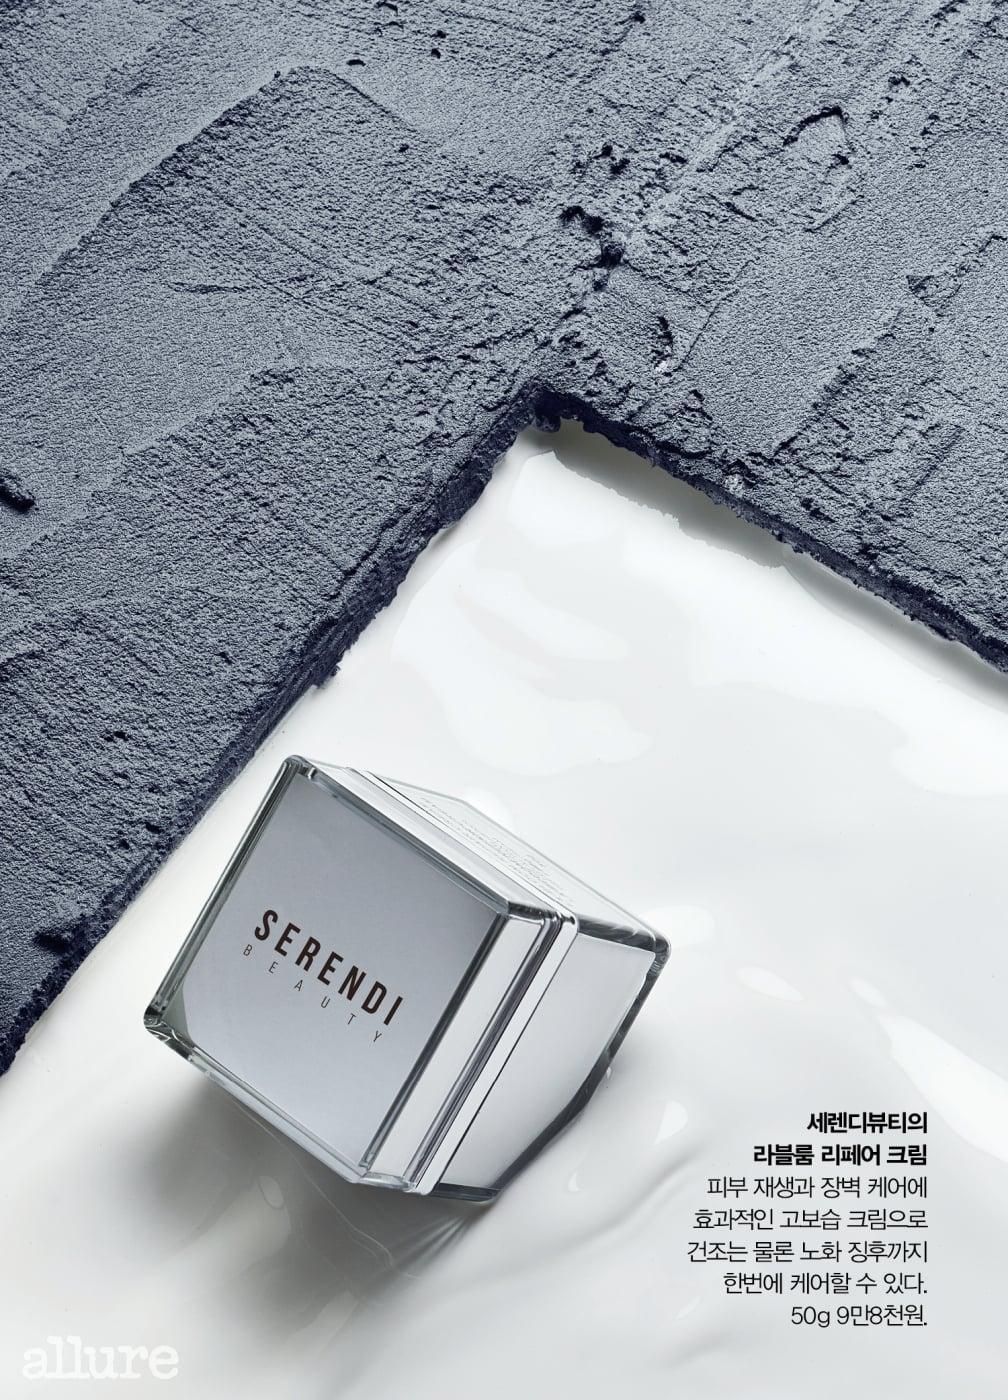 1901_NAVER post_고보습 스페셜-9